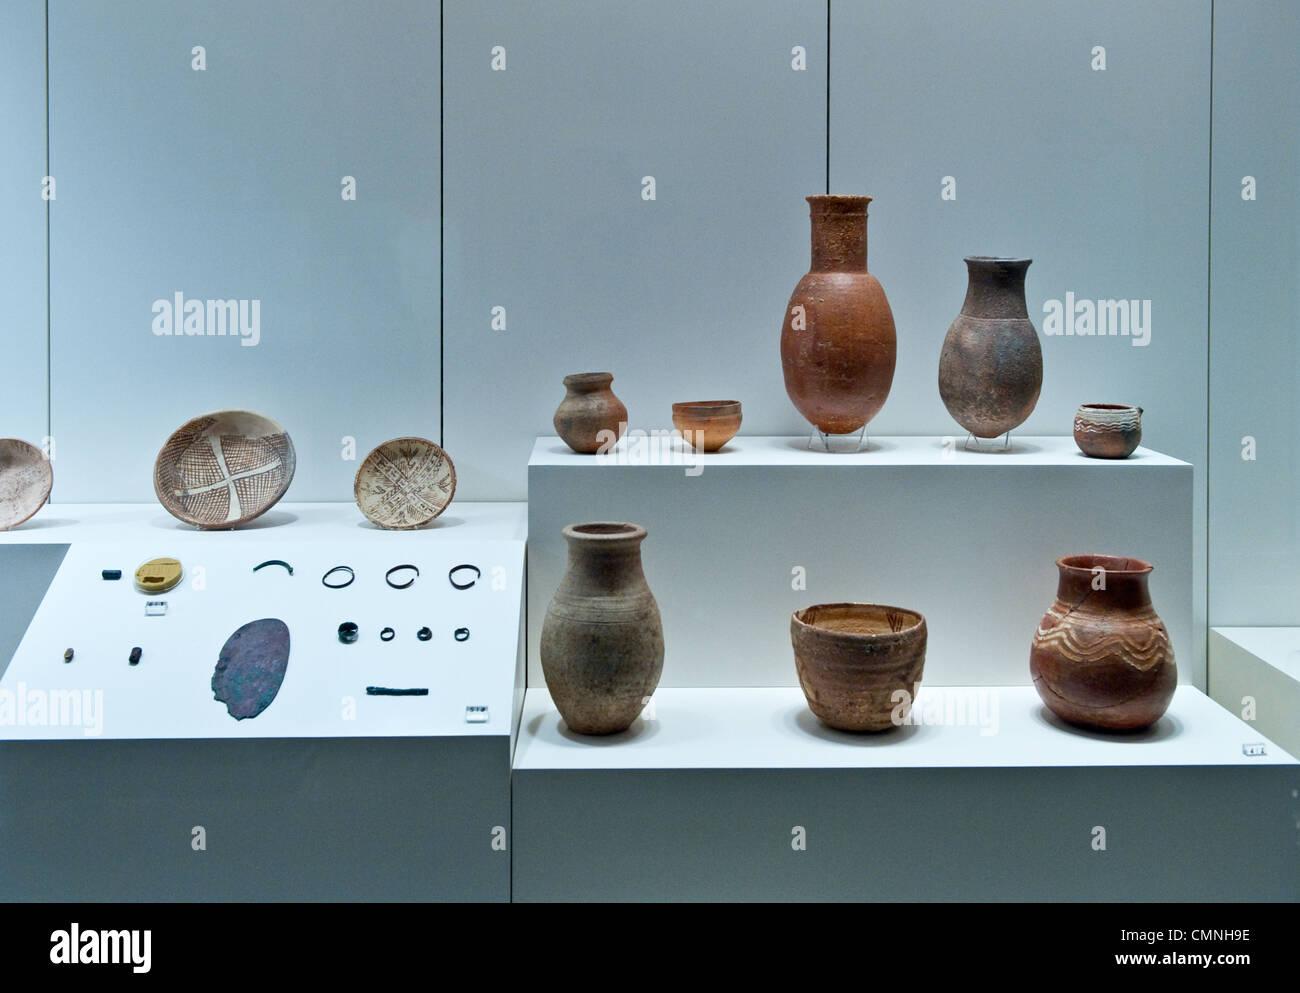 Asia Saudi Arabia Riyadh The National museum archaeological remains